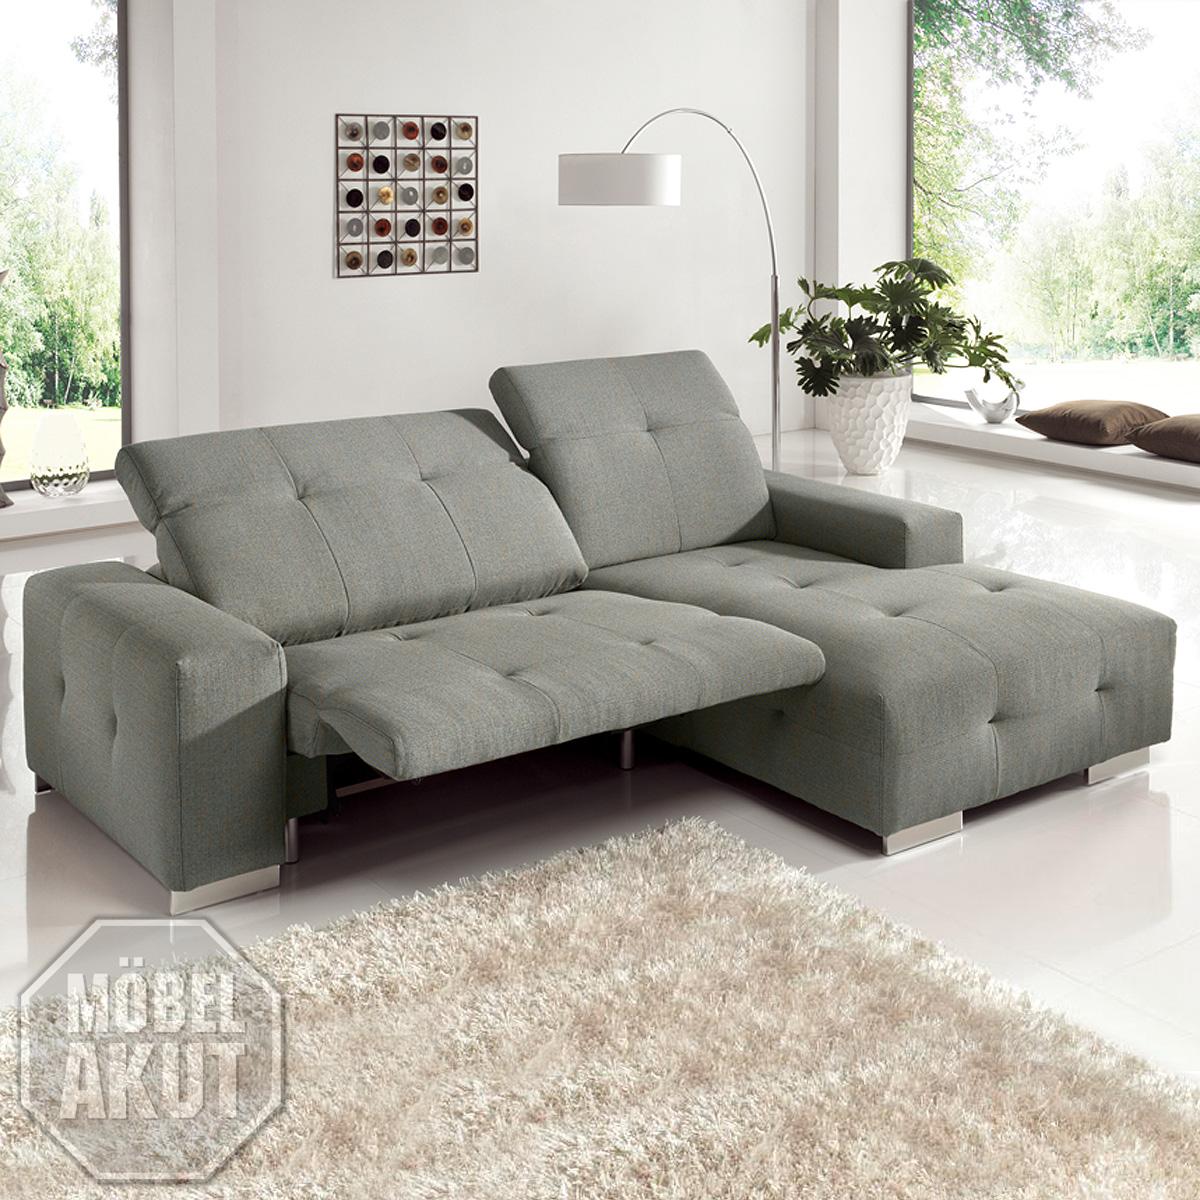 ecksofa francisco sofa grau sand mit elektrischer. Black Bedroom Furniture Sets. Home Design Ideas